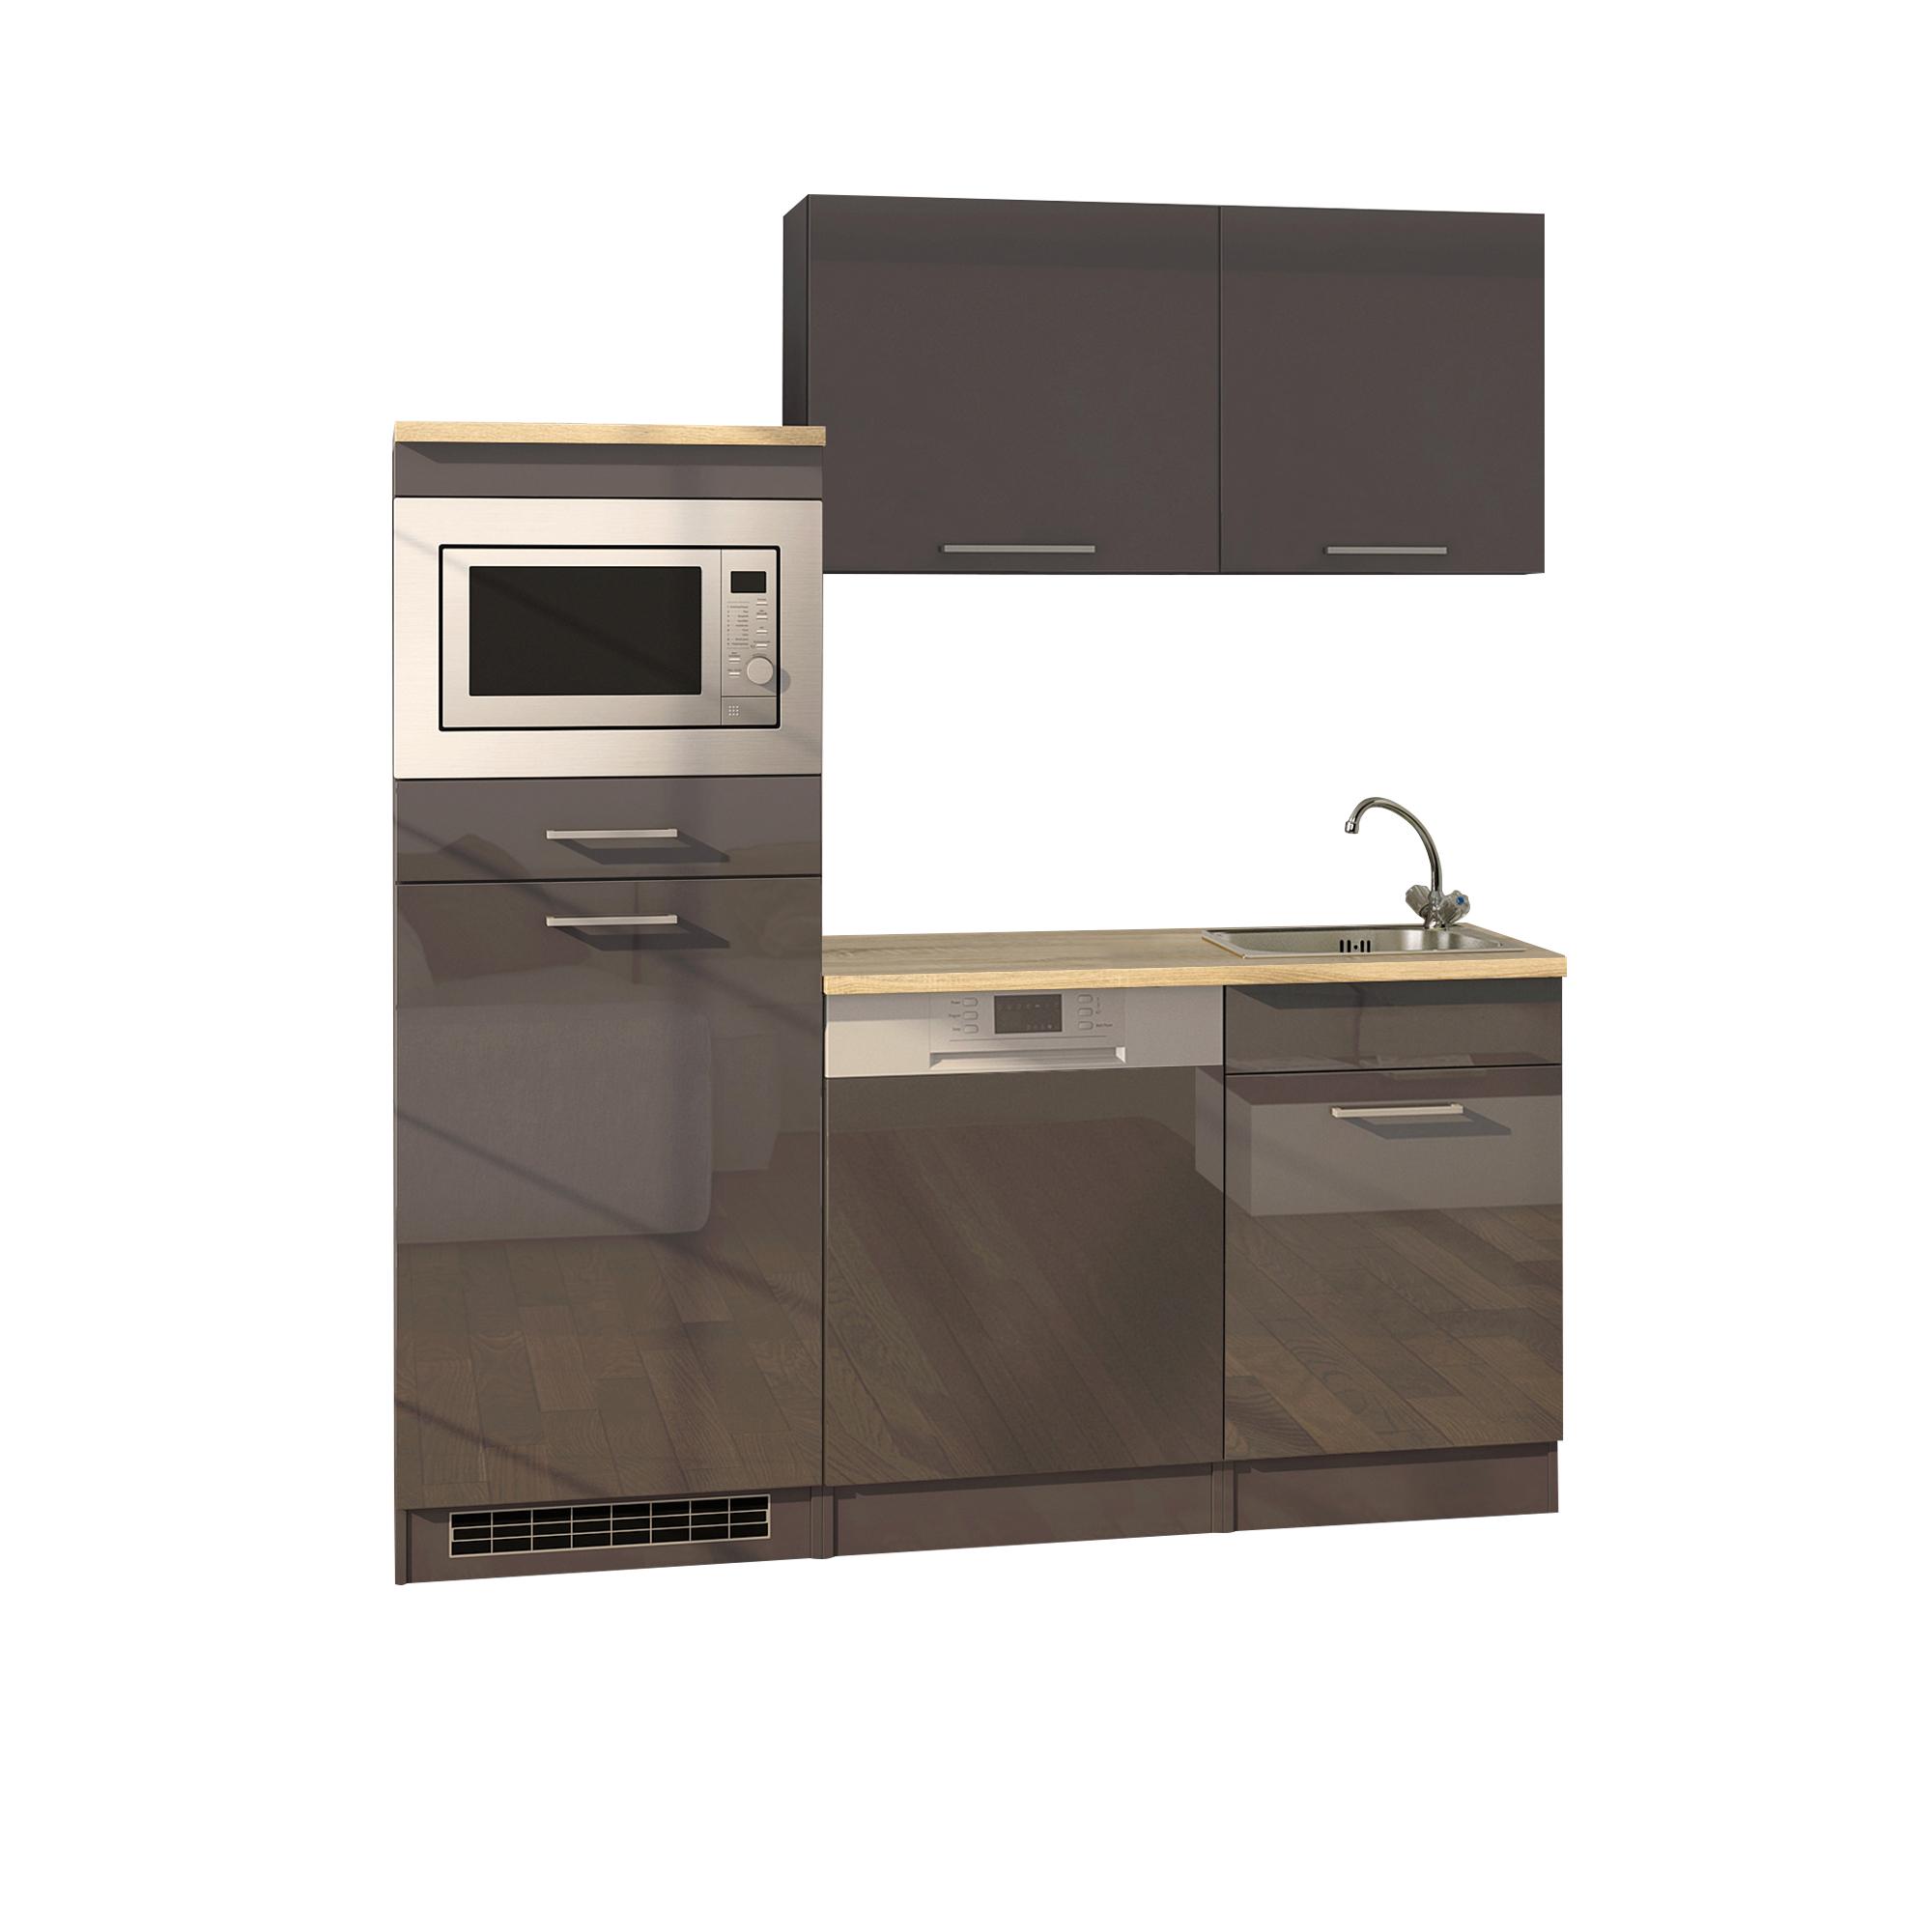 Full Size of Büro Küche Ohne Kochfeld Büro Küche Kochen Büro Küche Möbel Büro Küche Ideen Küche Büroküche